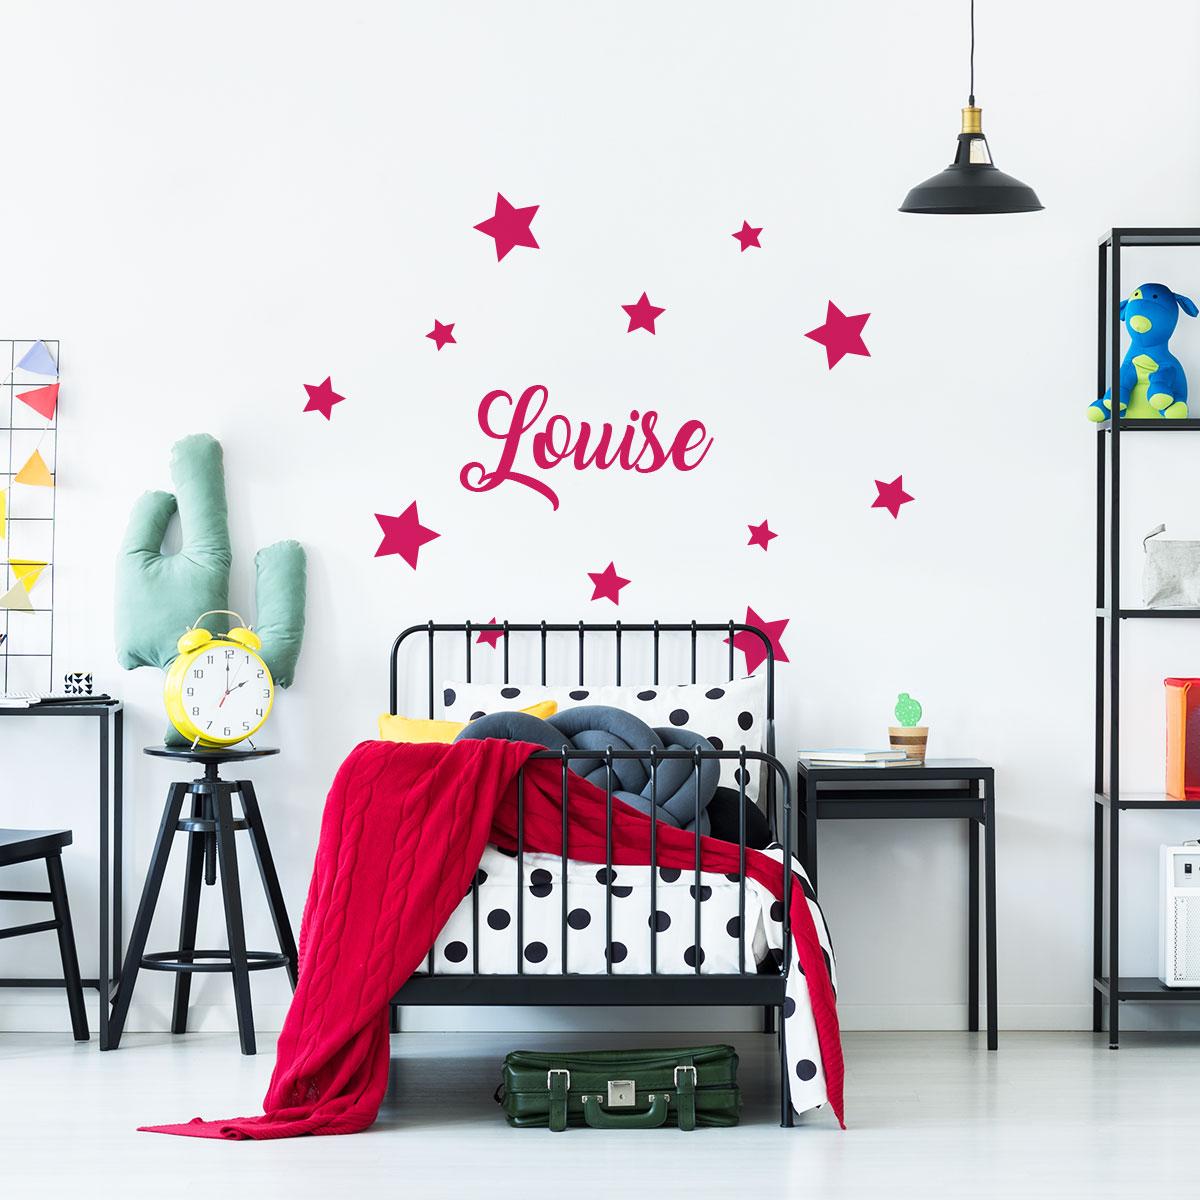 sticker pr nom personnalisable toiles chambre enfants. Black Bedroom Furniture Sets. Home Design Ideas